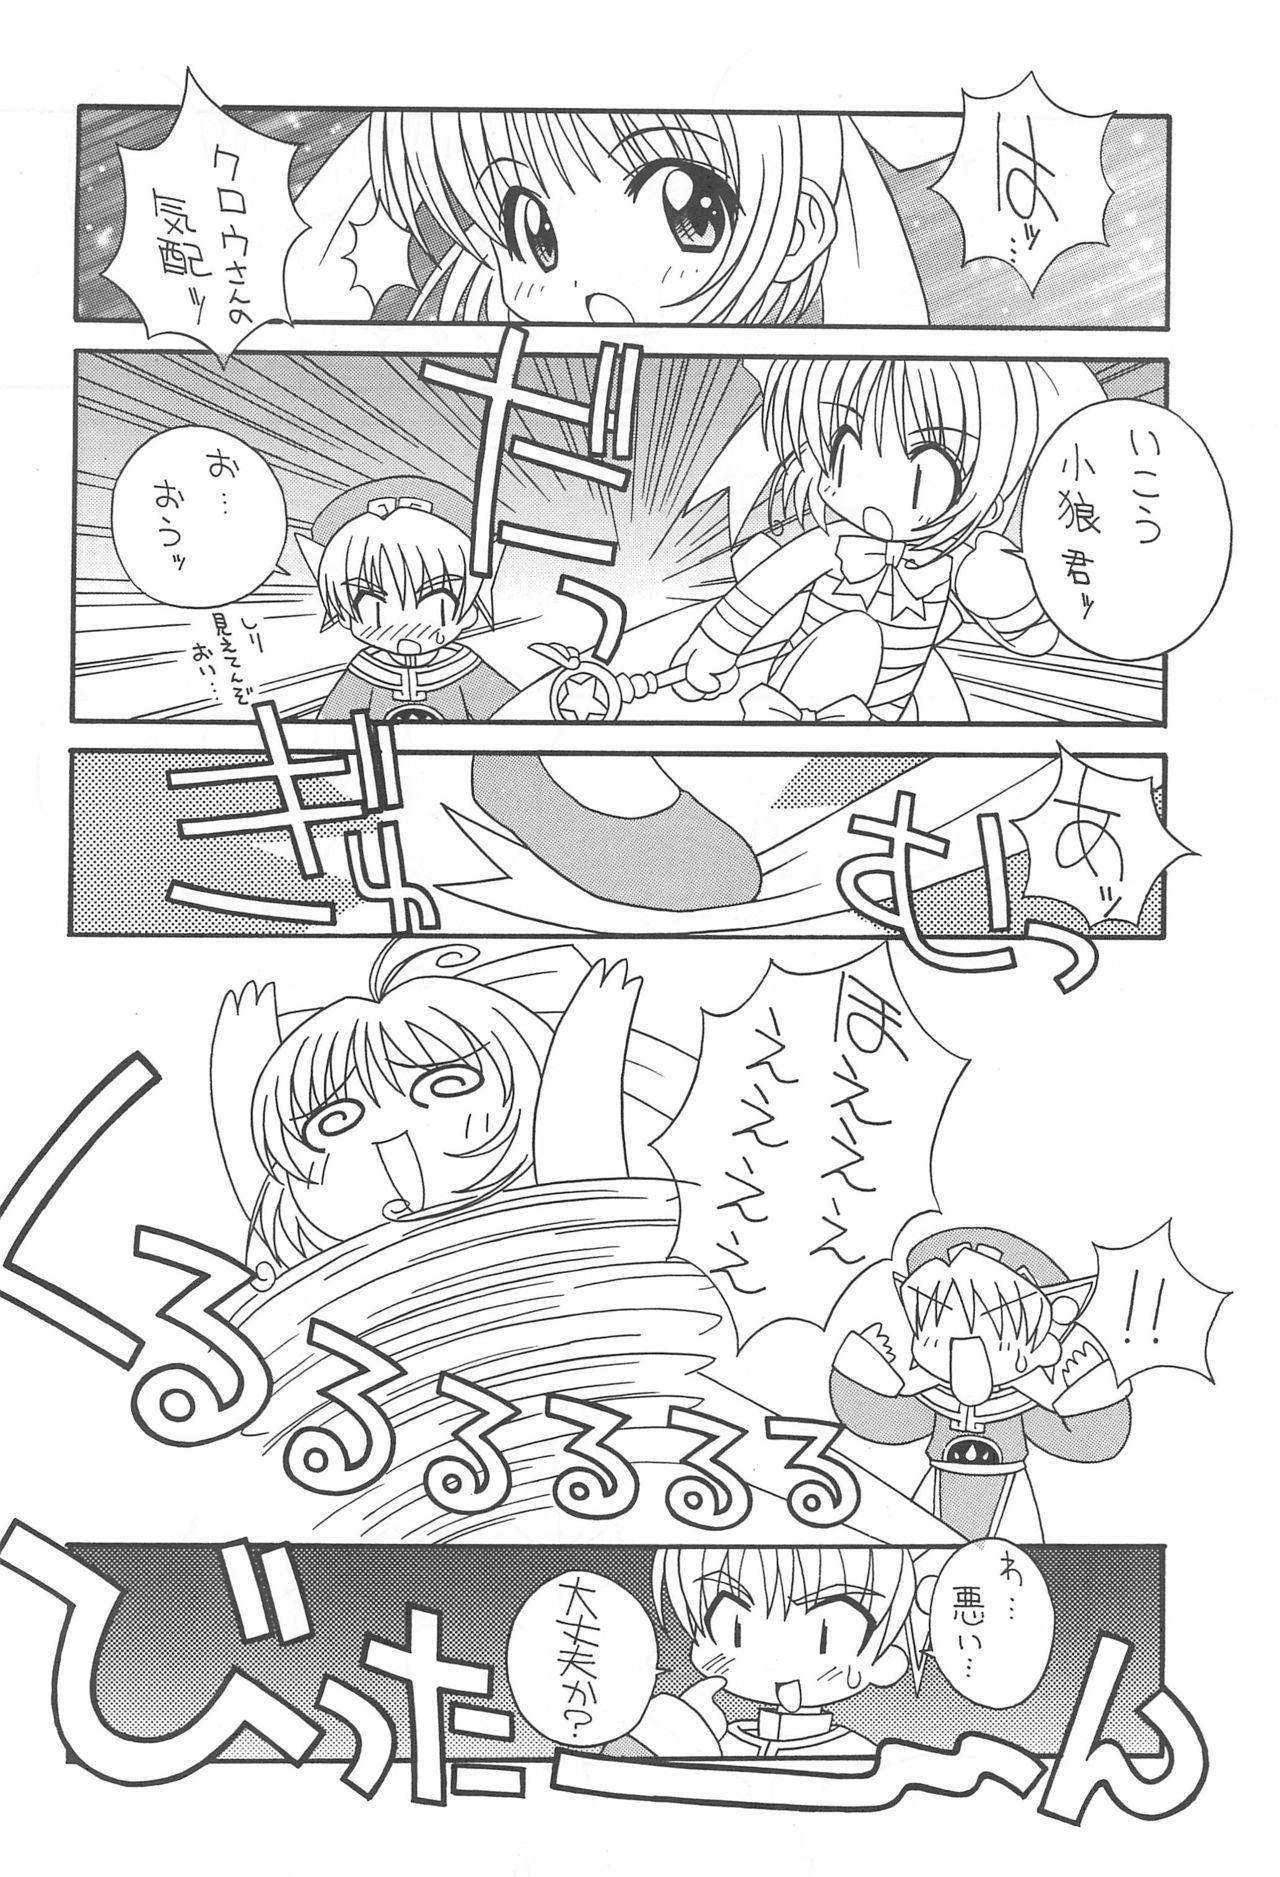 Soko da! Ninpou Youji Taikei no Jutsu 2nd 5